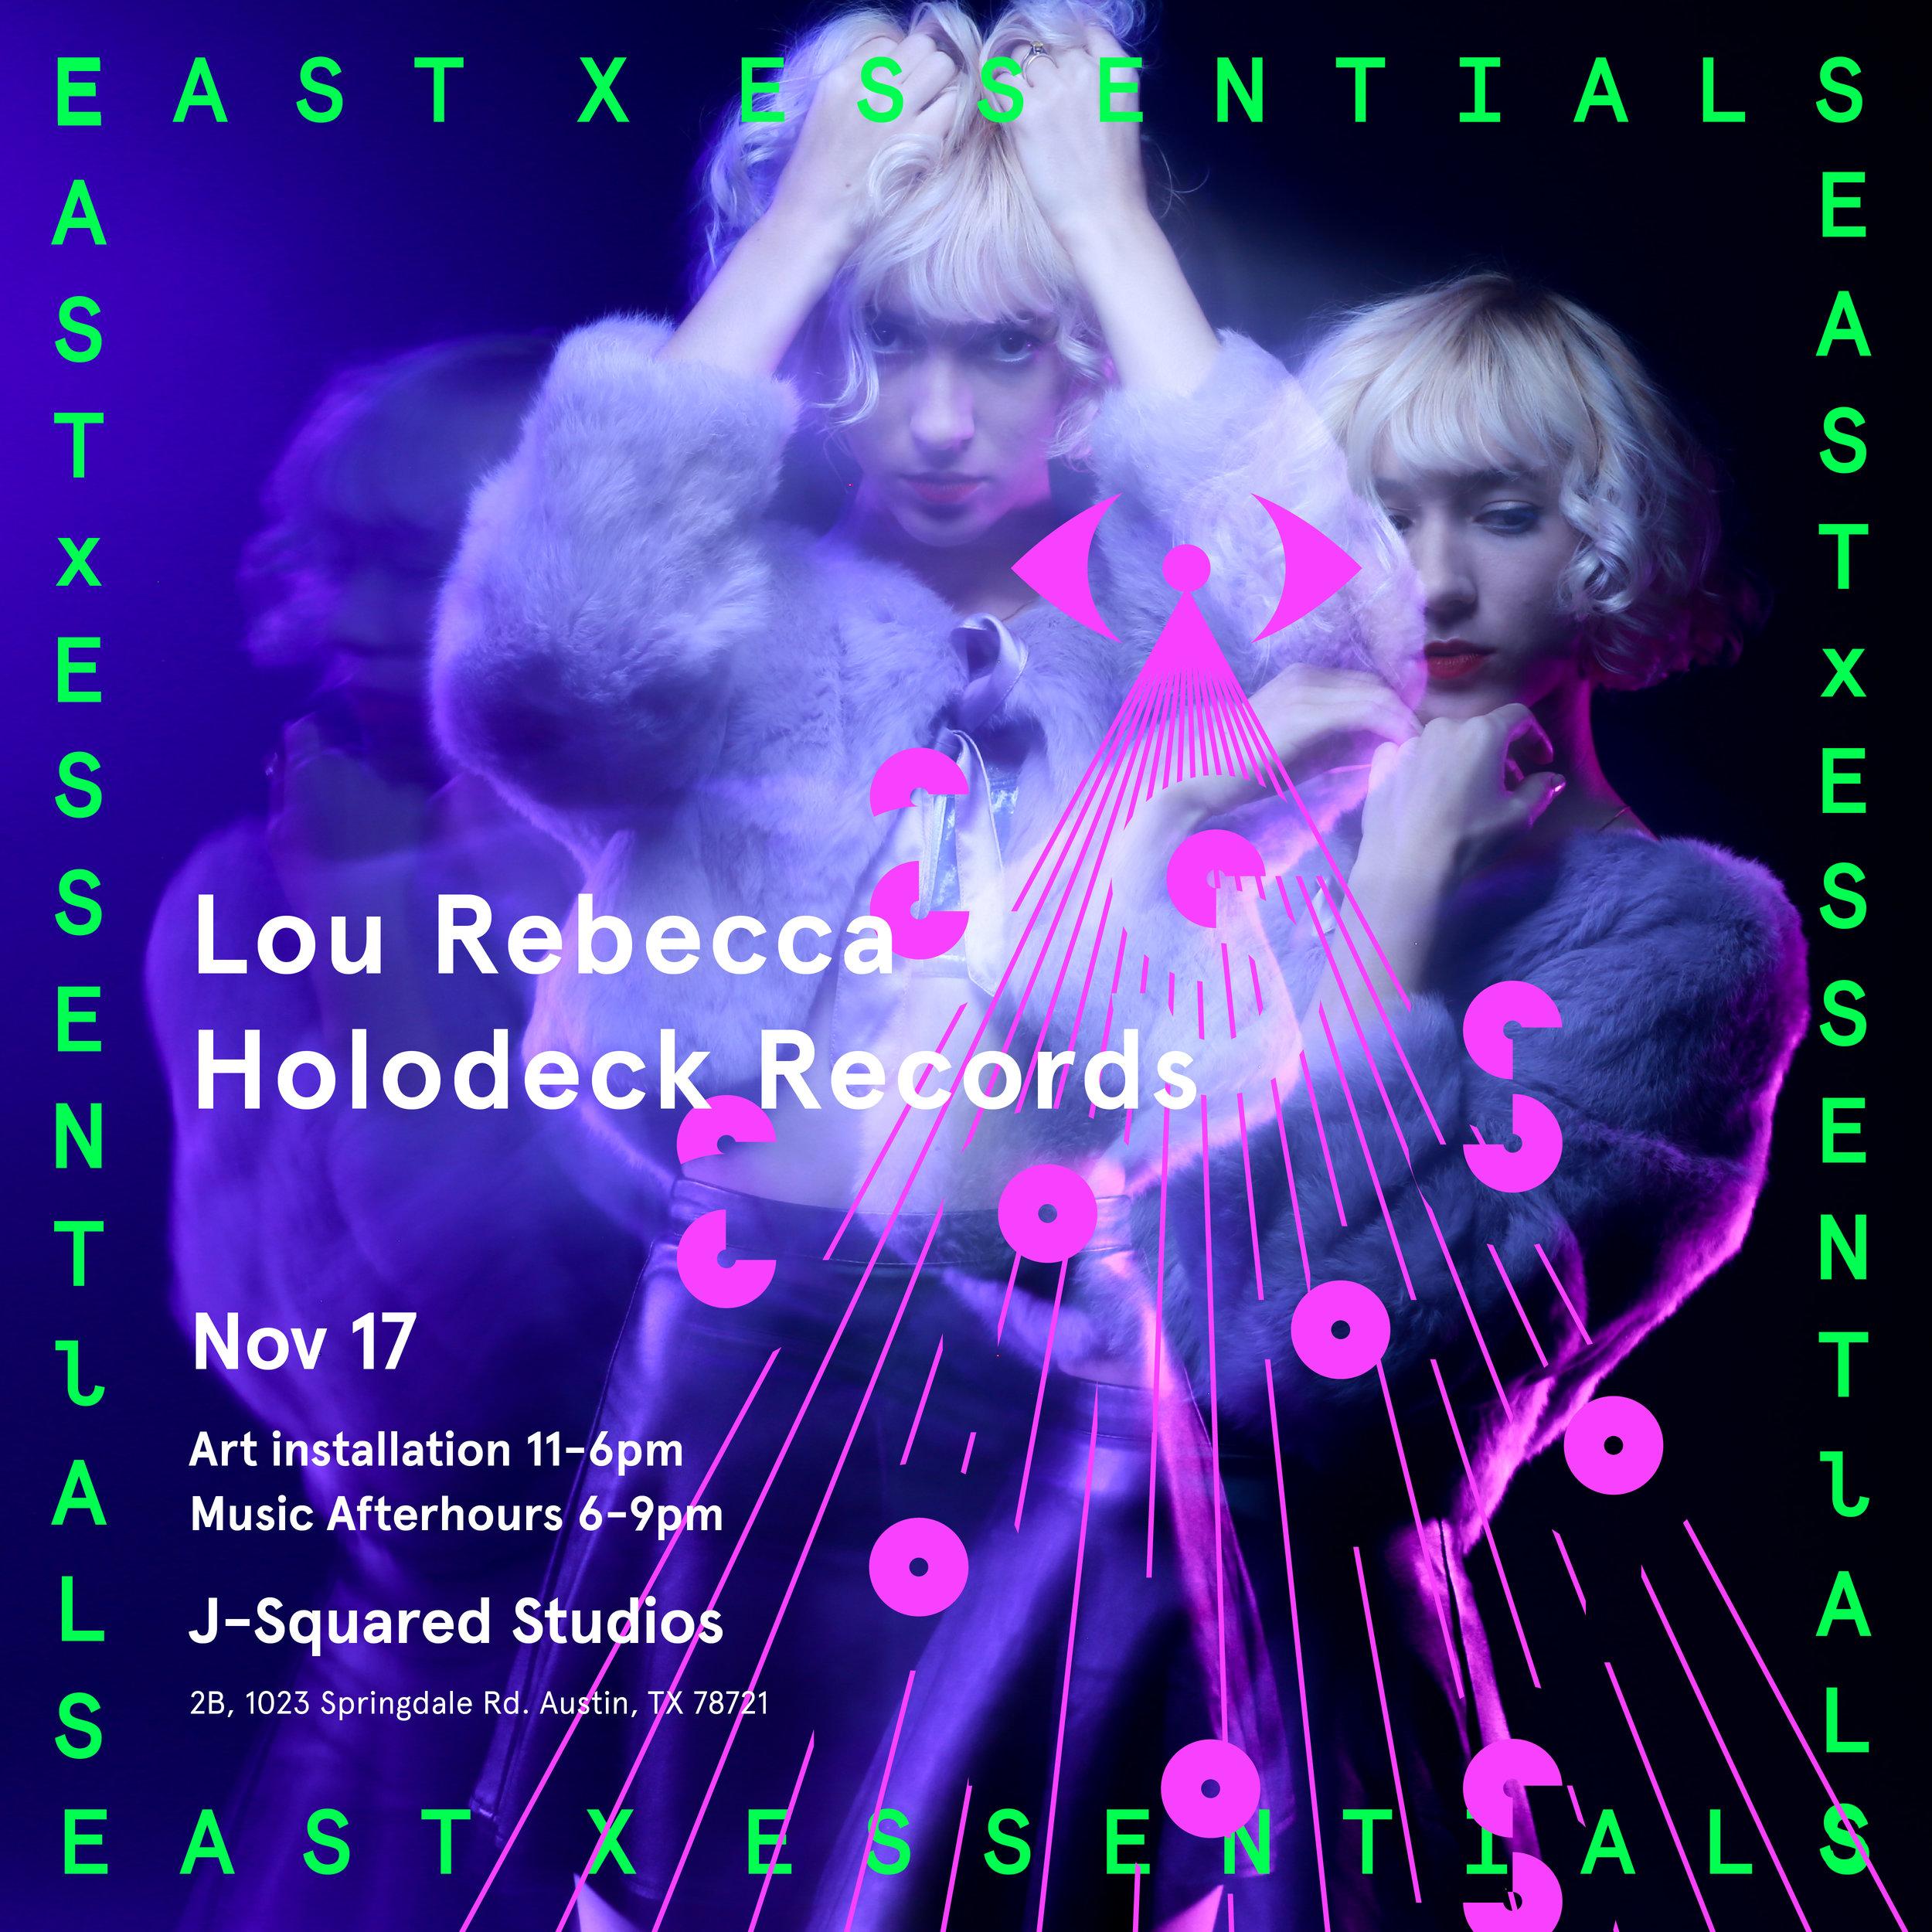 Lou Rebecca, Alternate flyer for EAST X ESSENTIALS CREATIVE